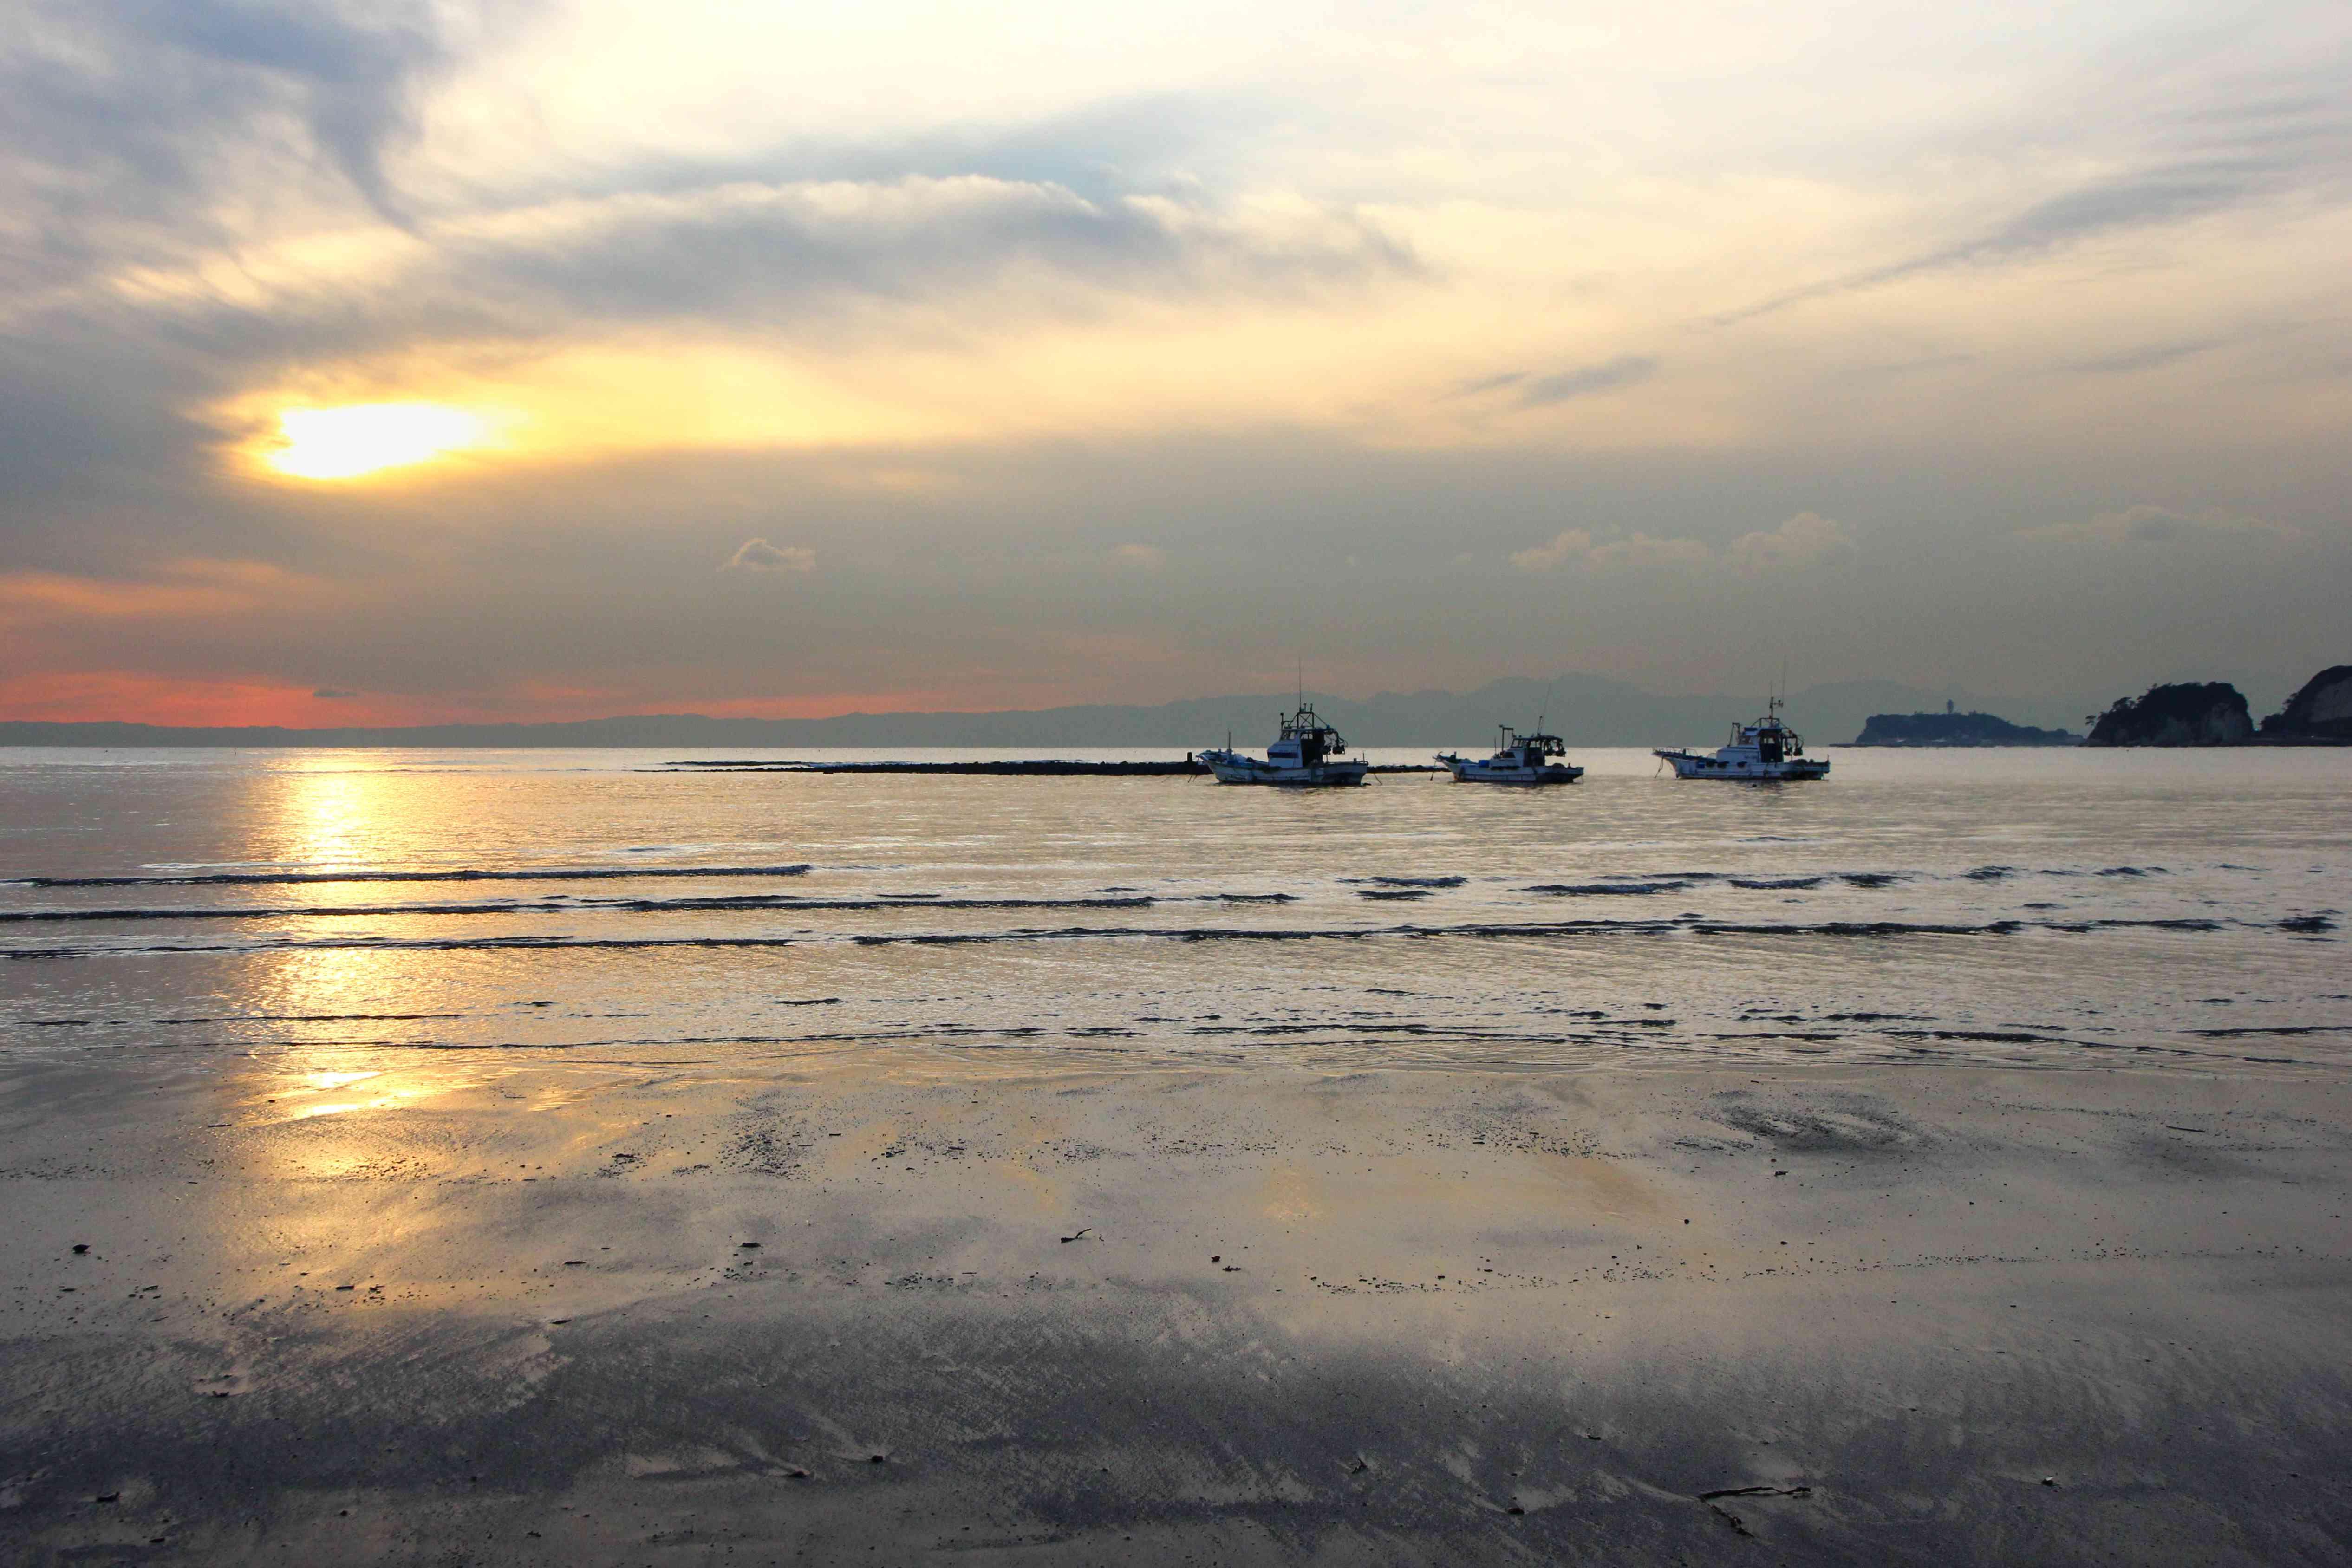 3 boats on right horizon as sun sets on ocean beach